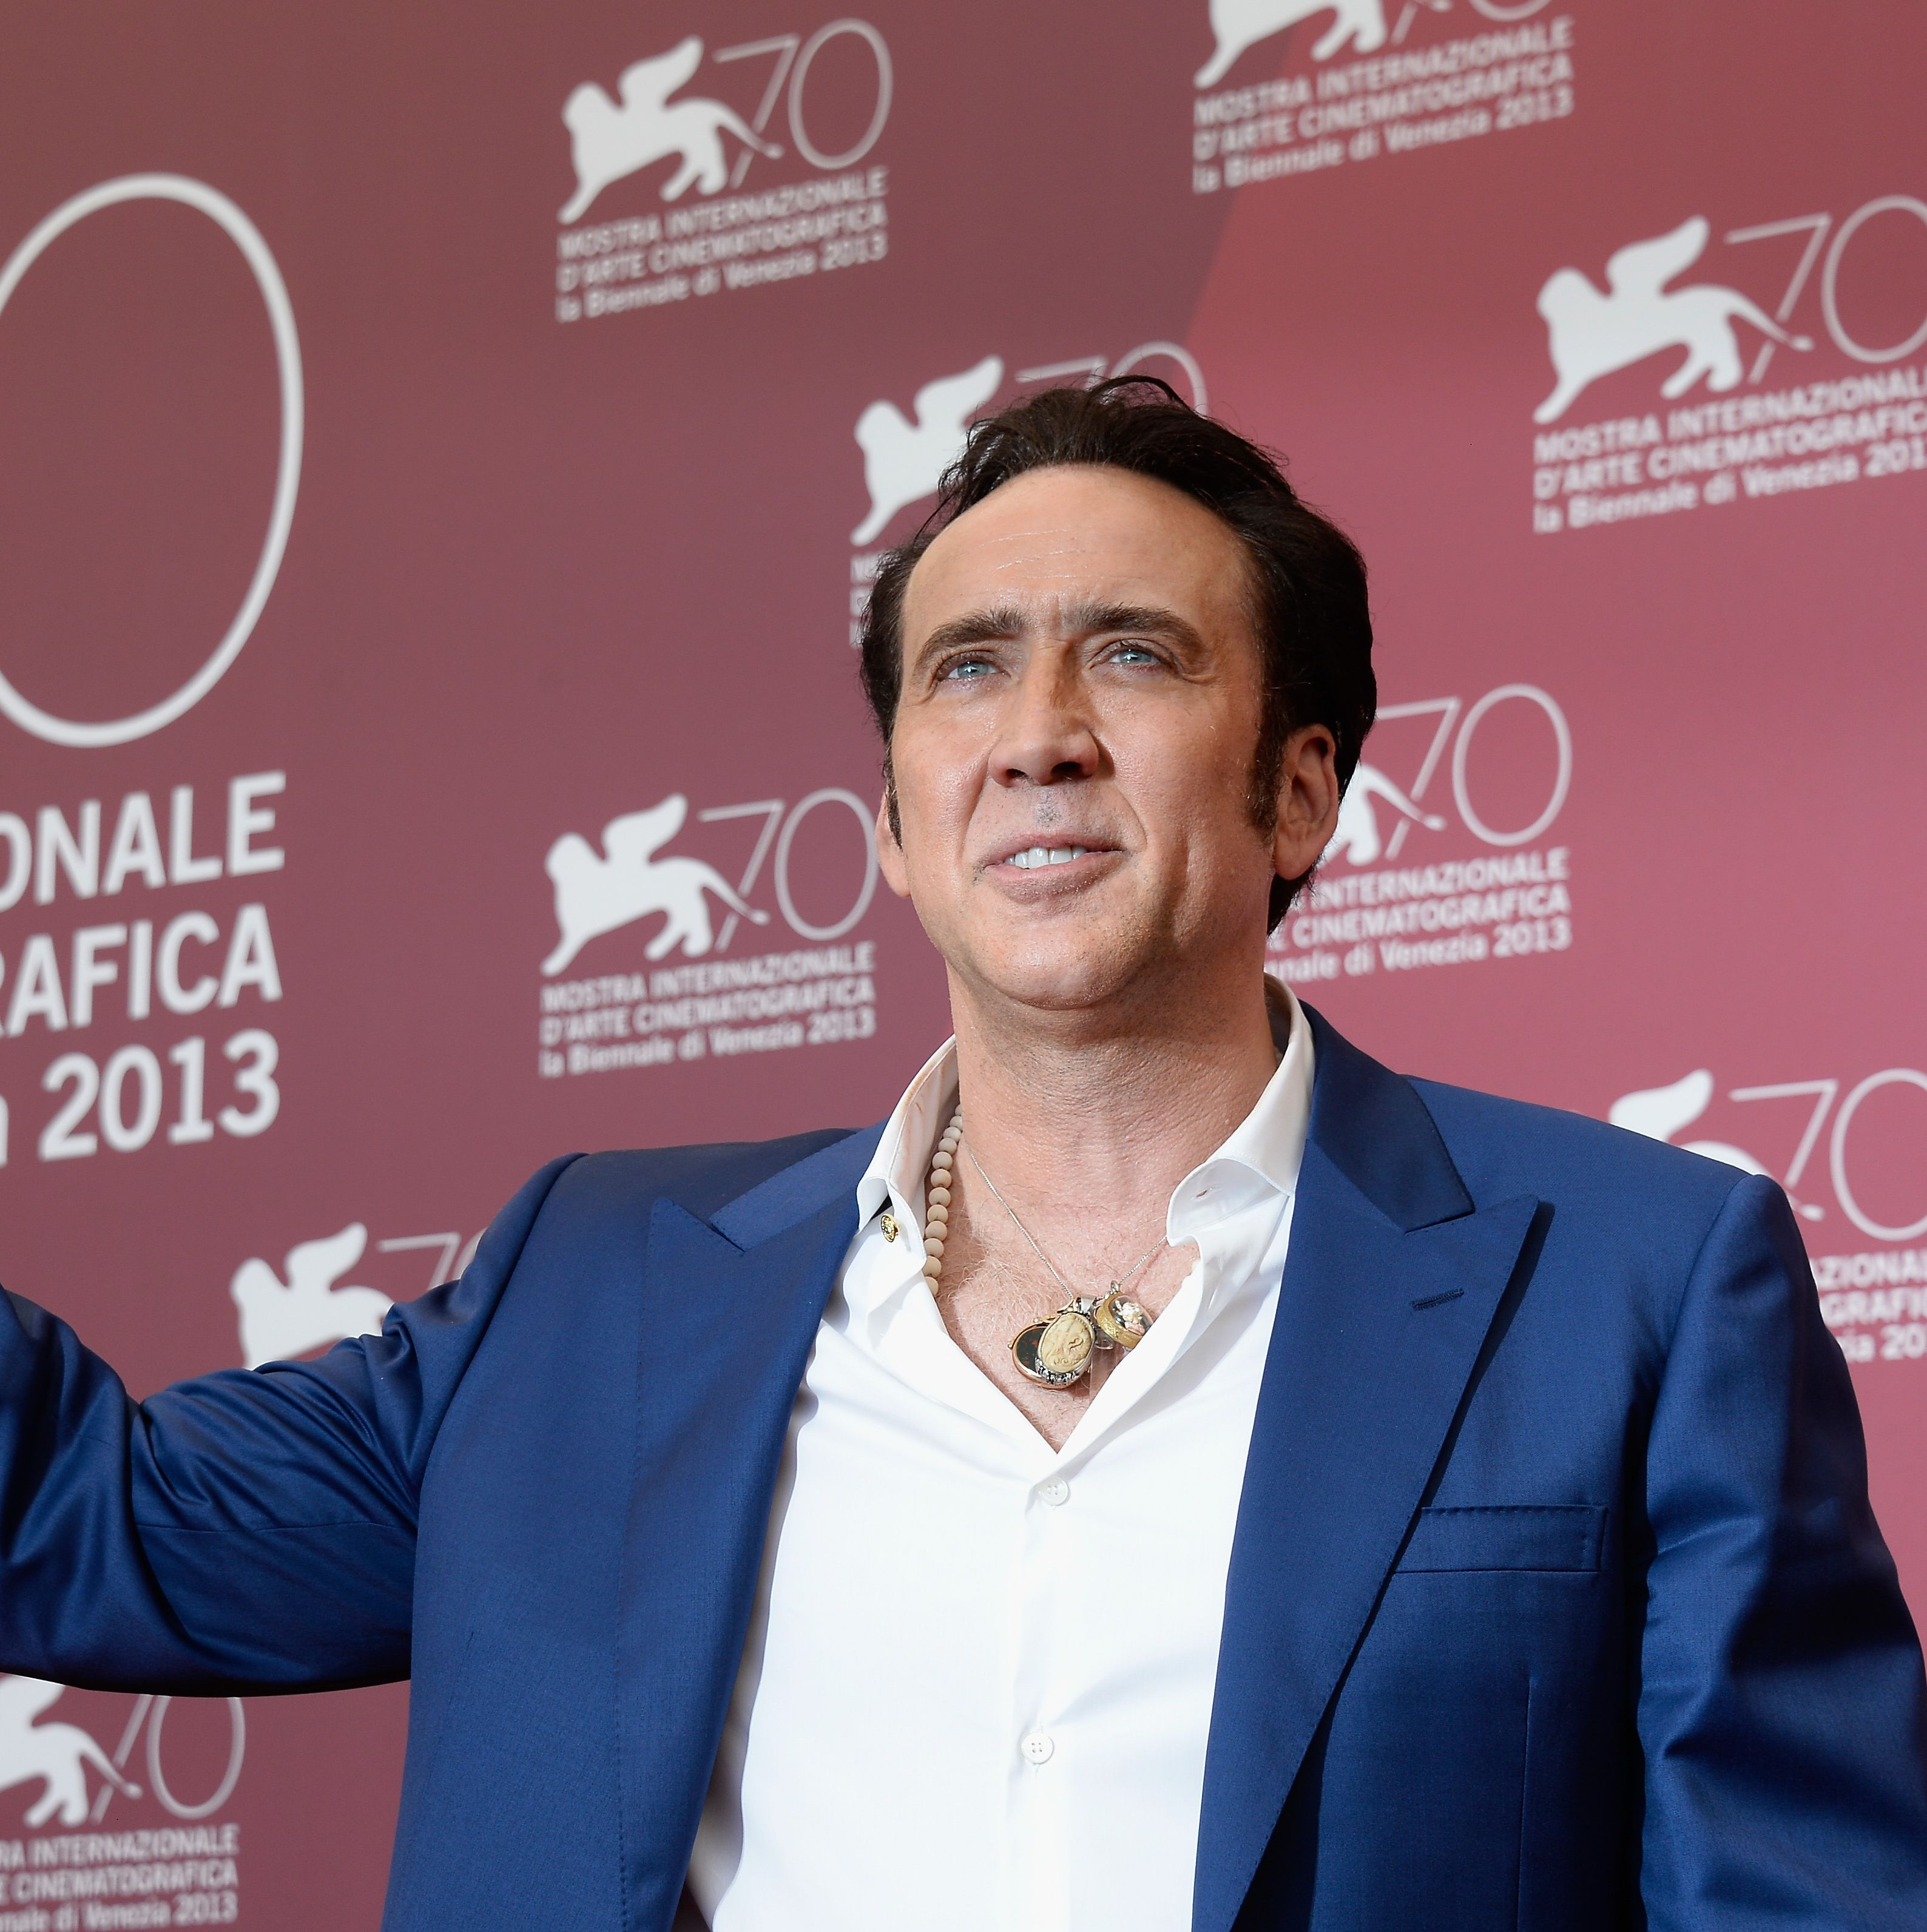 Nicolas Cage's New Sci-Fi Martial Arts Movie 'Jiu Jitsu' Already Sounds Epic